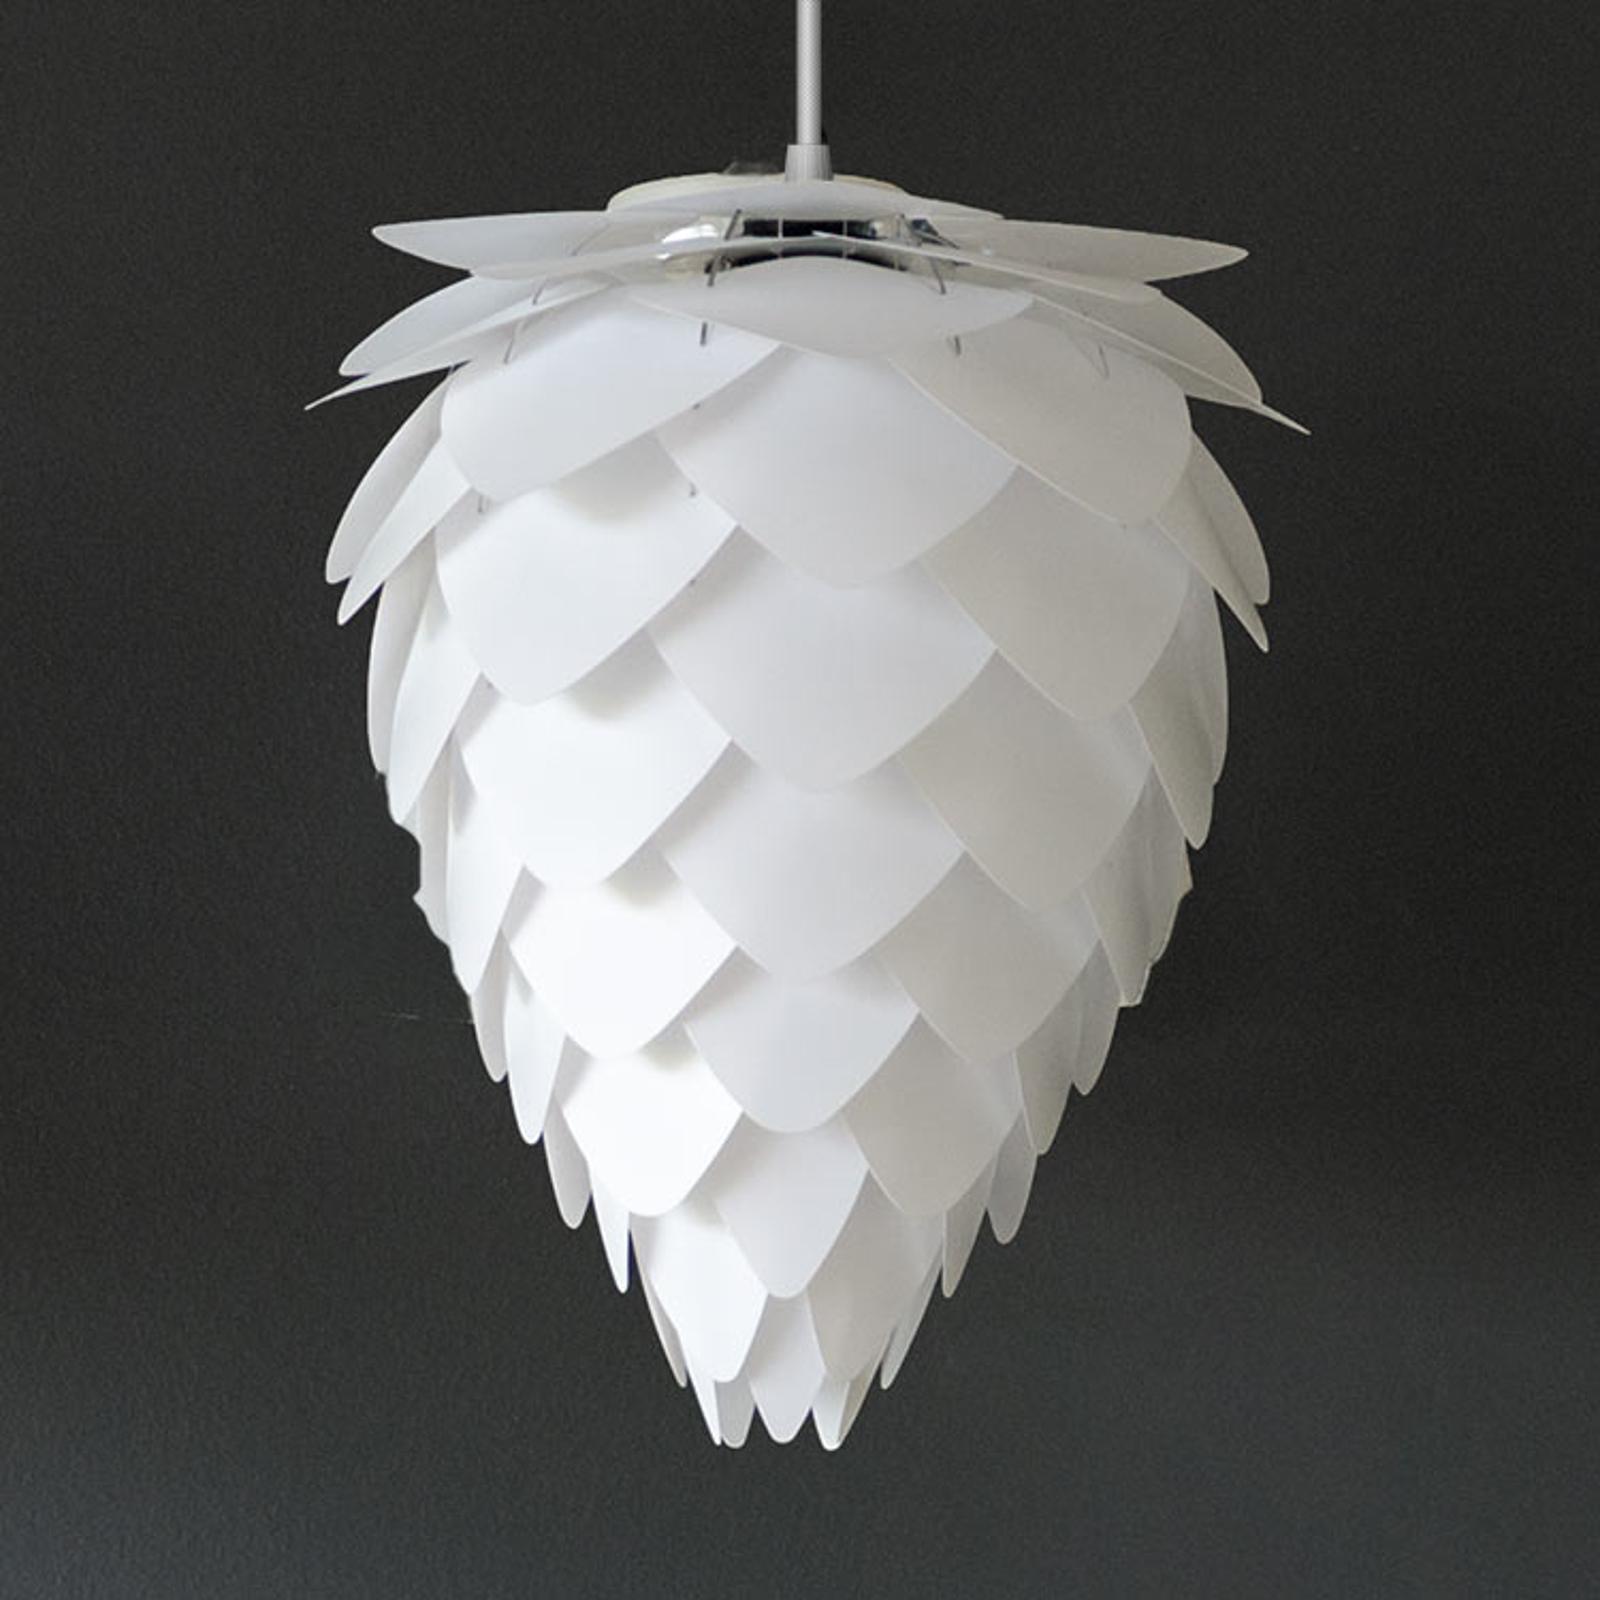 Lampa wisząca Conia mini, biała, stożkowata